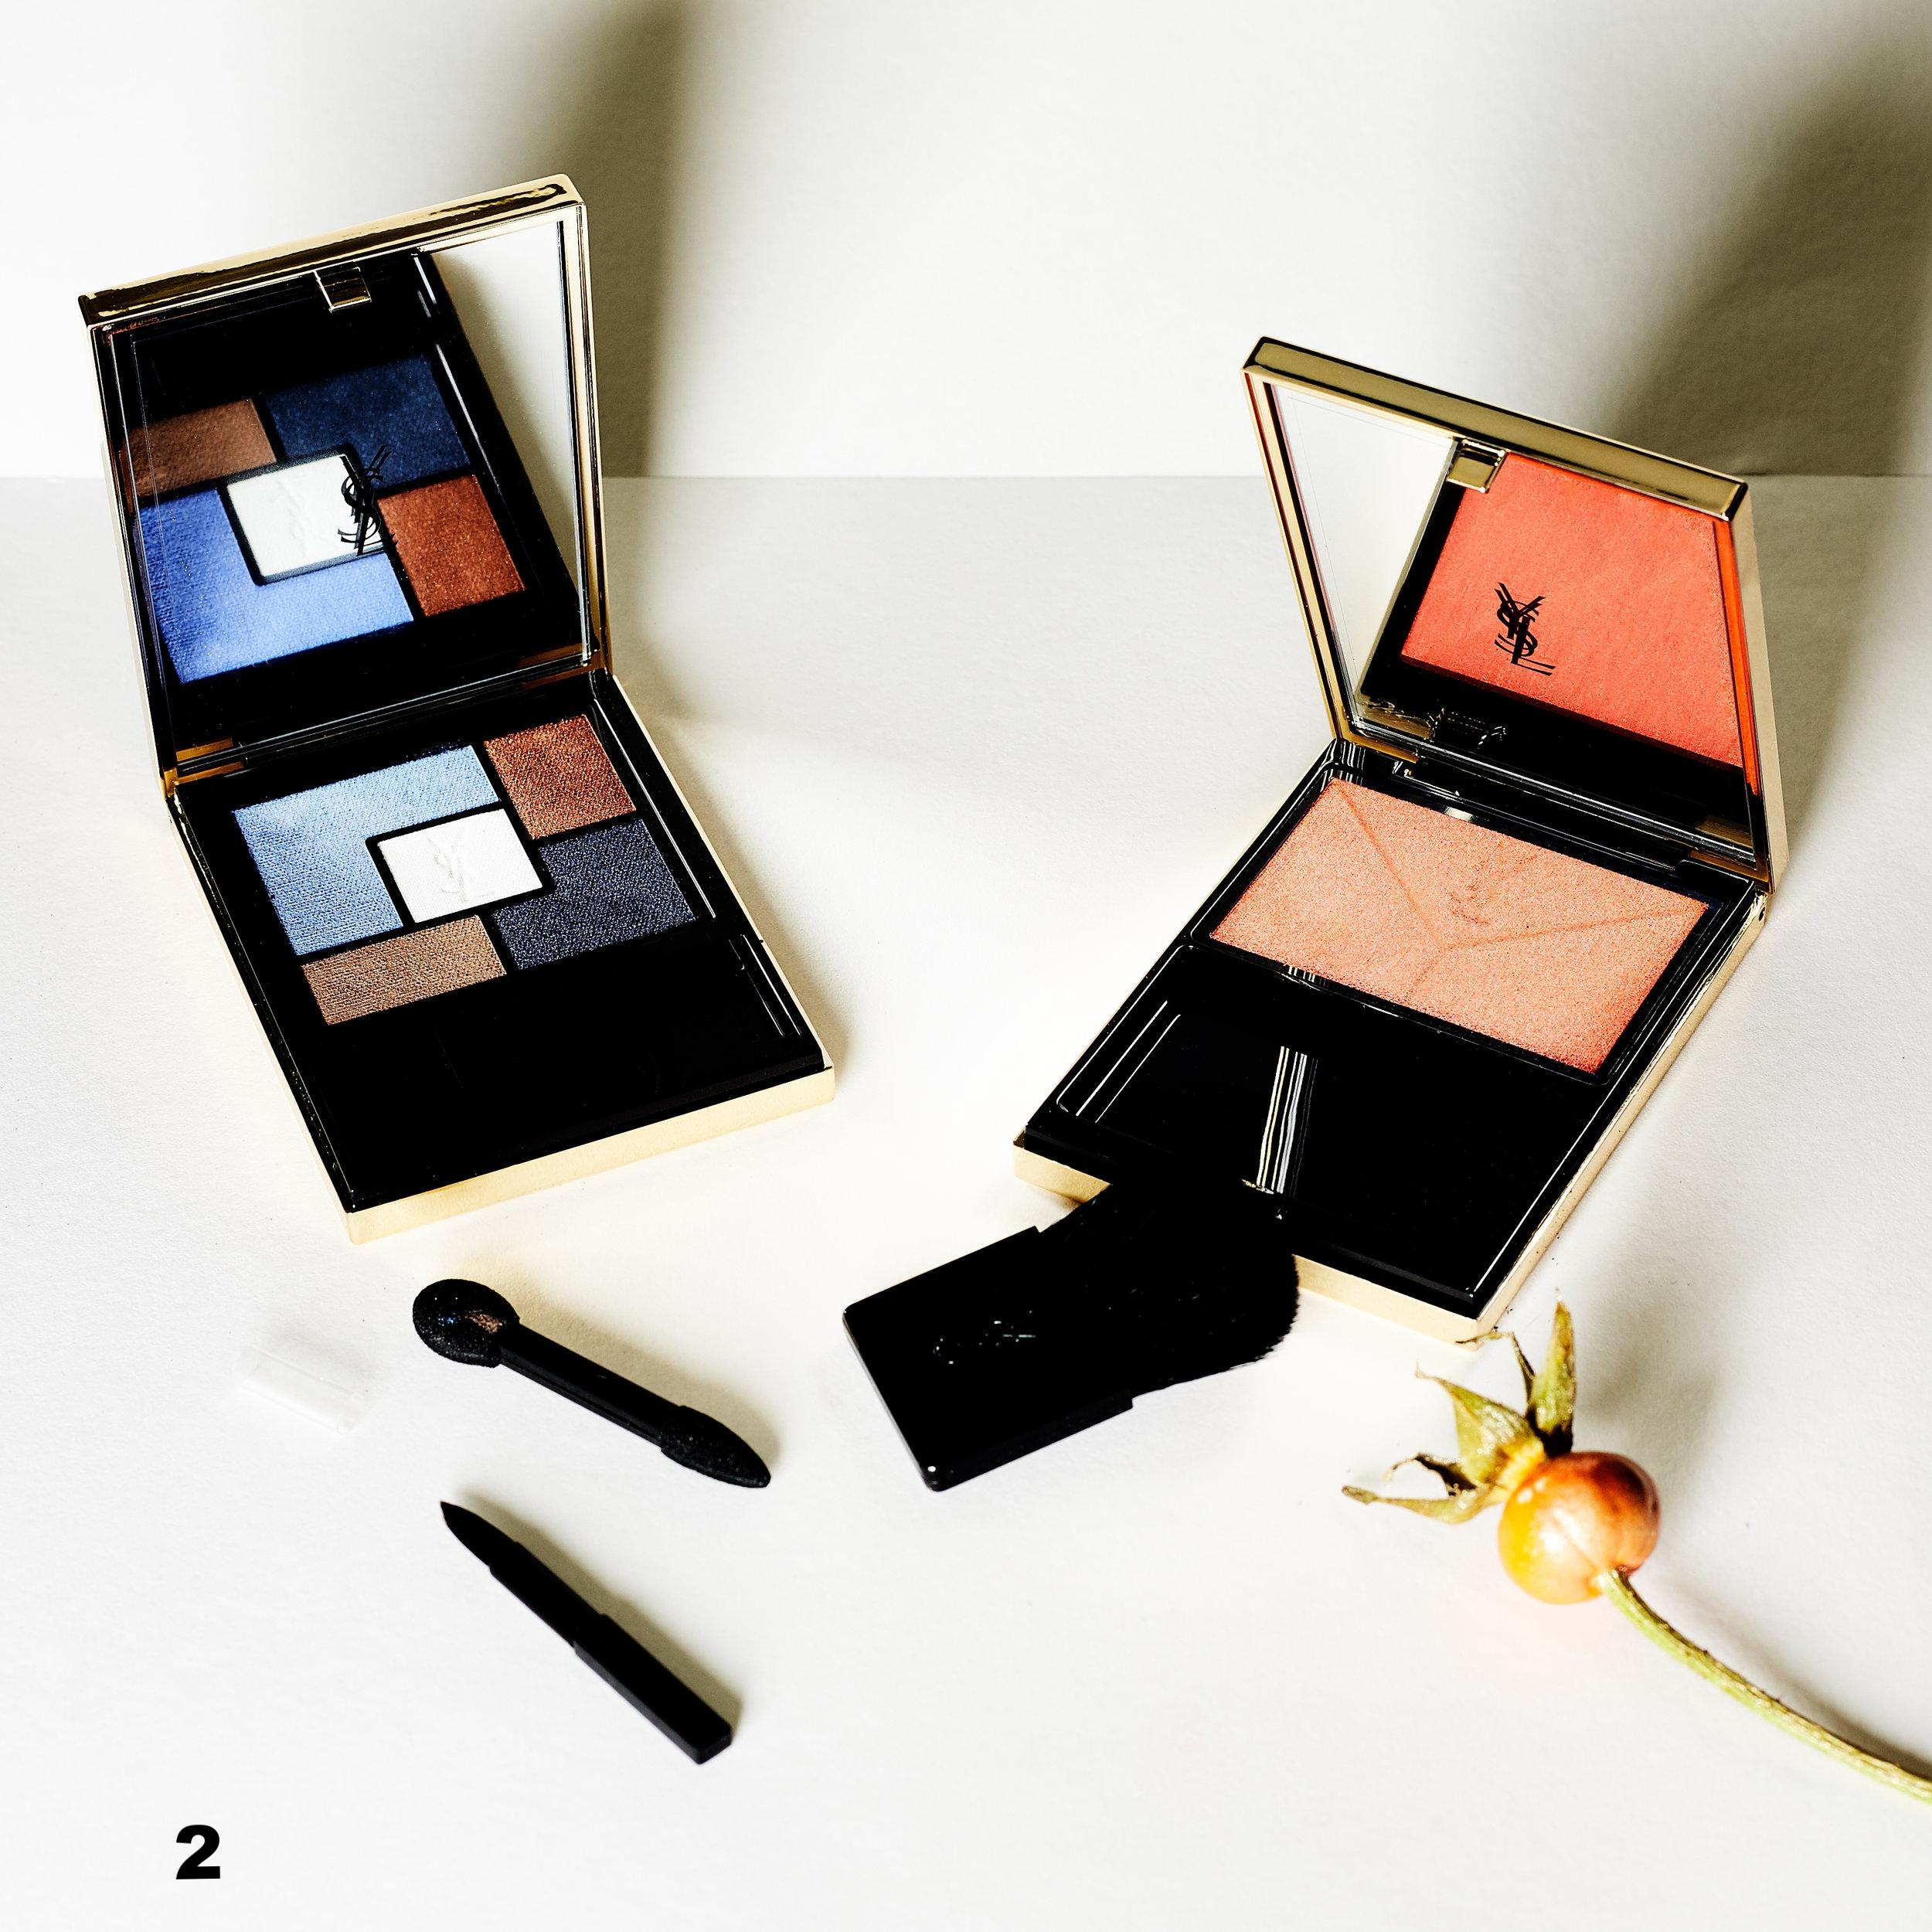 AsiaWerbel_makeup72dpi 34.jpg